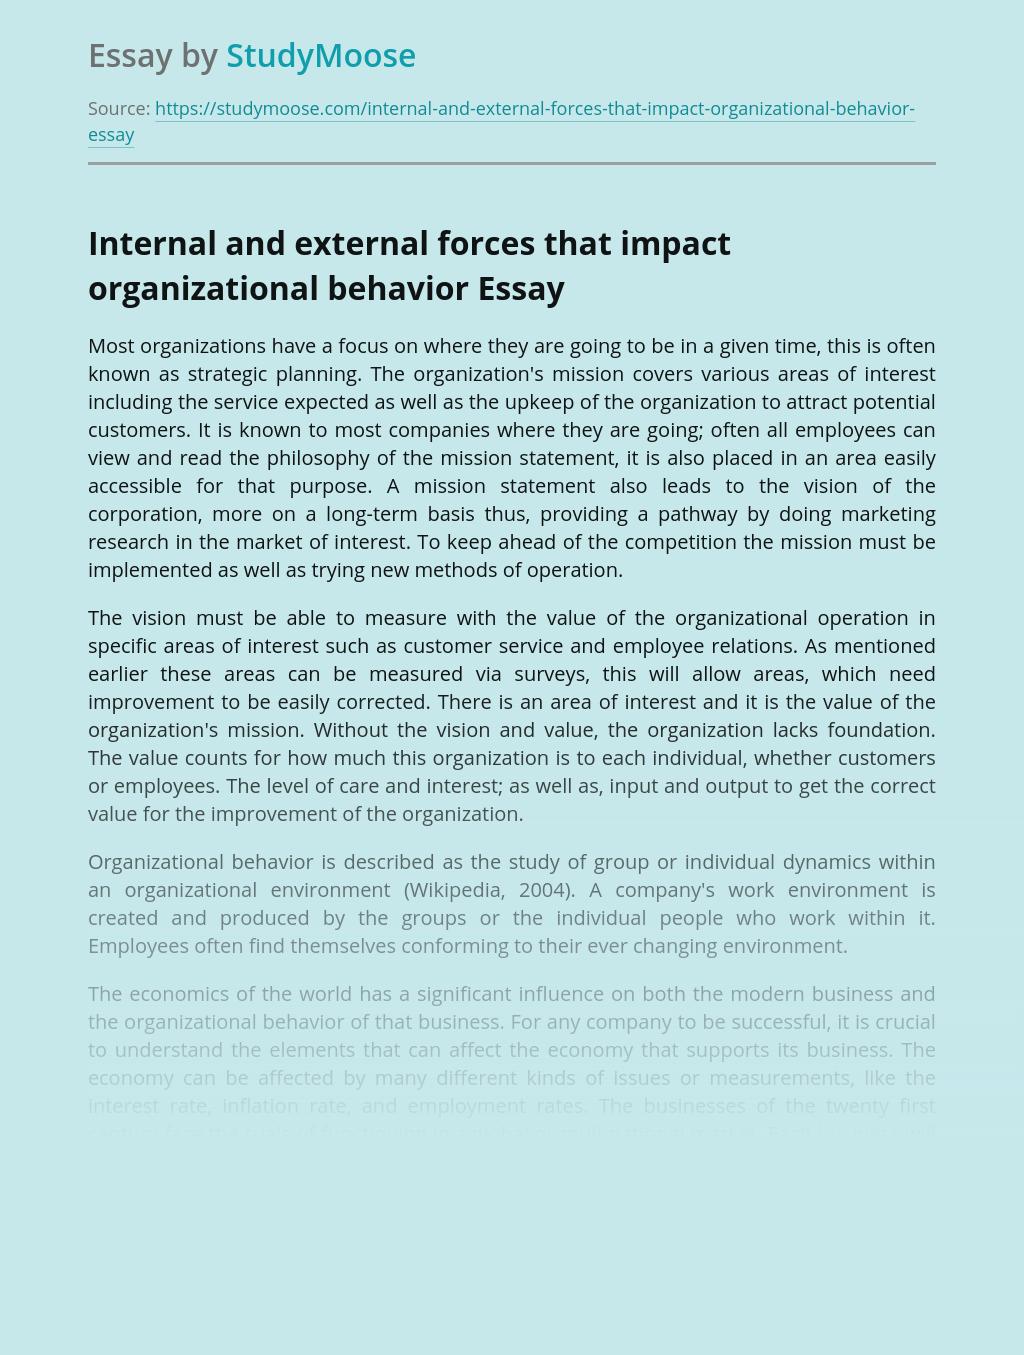 Internal and external forces that impact organizational behavior